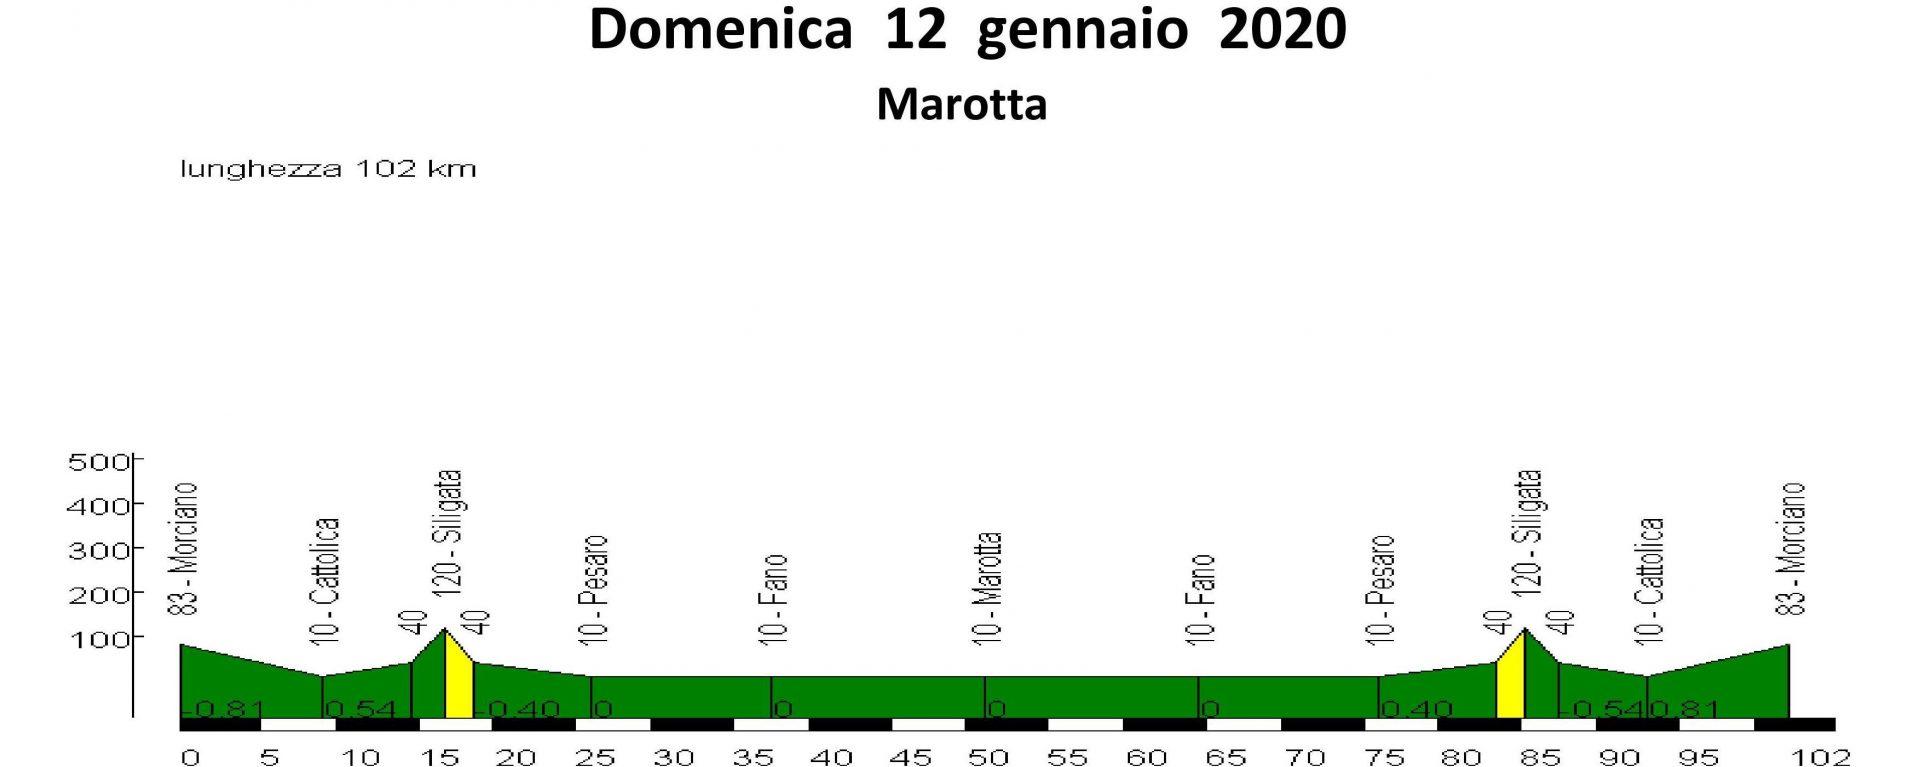 Domenica 12-gen-2020 Marotta